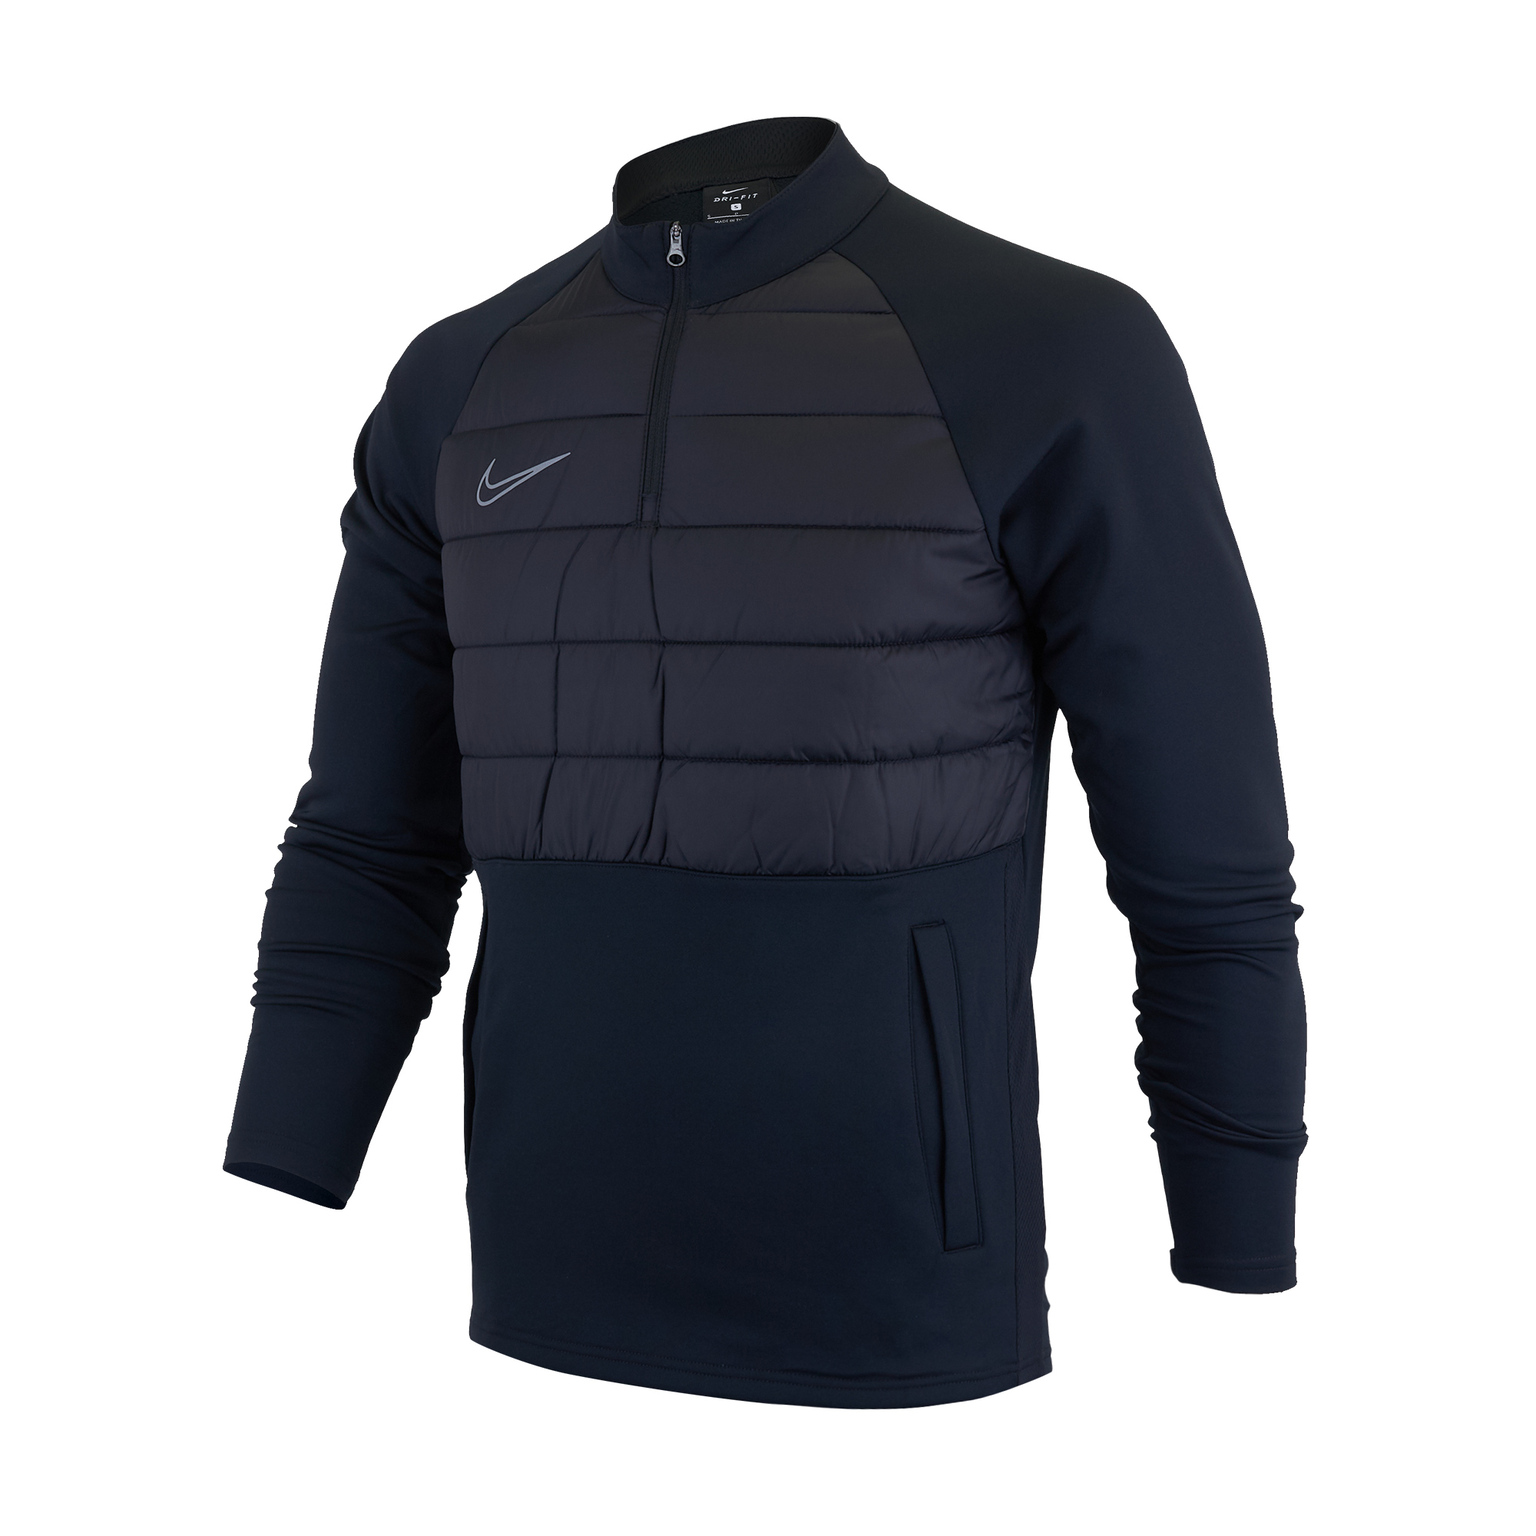 Свитер тренировочный Nike Dry Pad Dril Top BQ7473-010